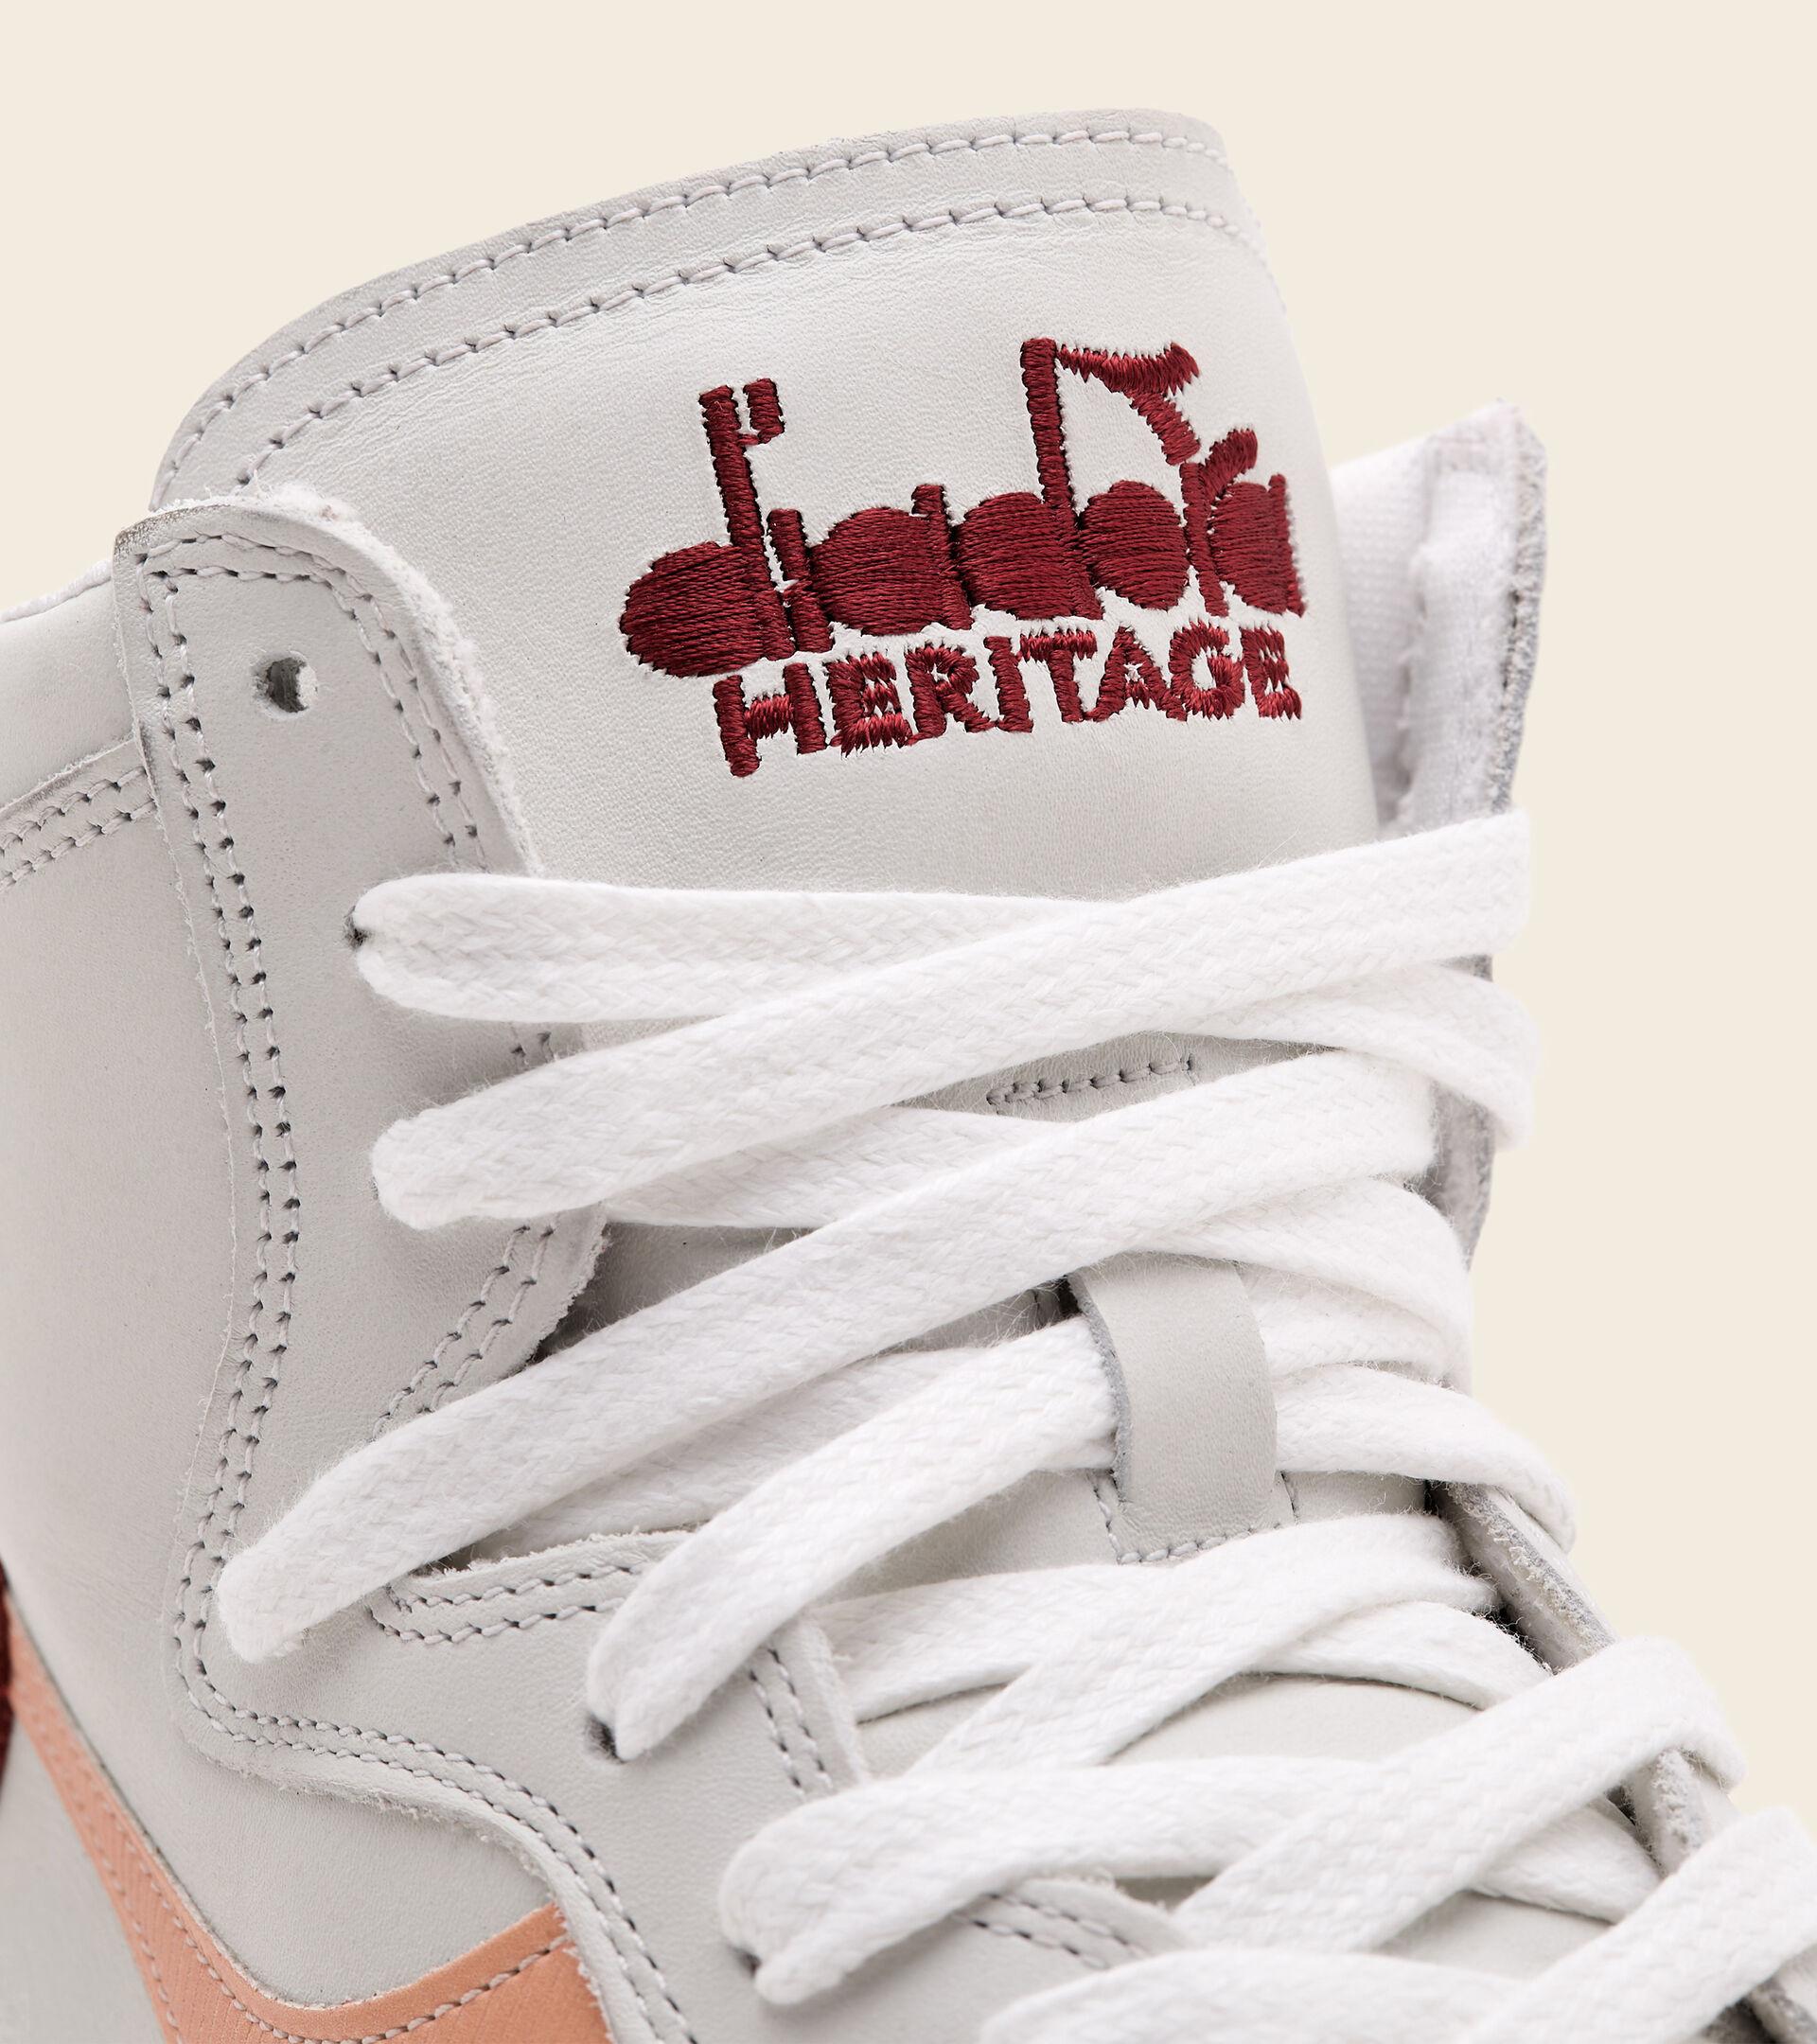 Heritage Trainer - Unisex MI BASKET USED WHITE/PEACH NOUGAT - Diadora